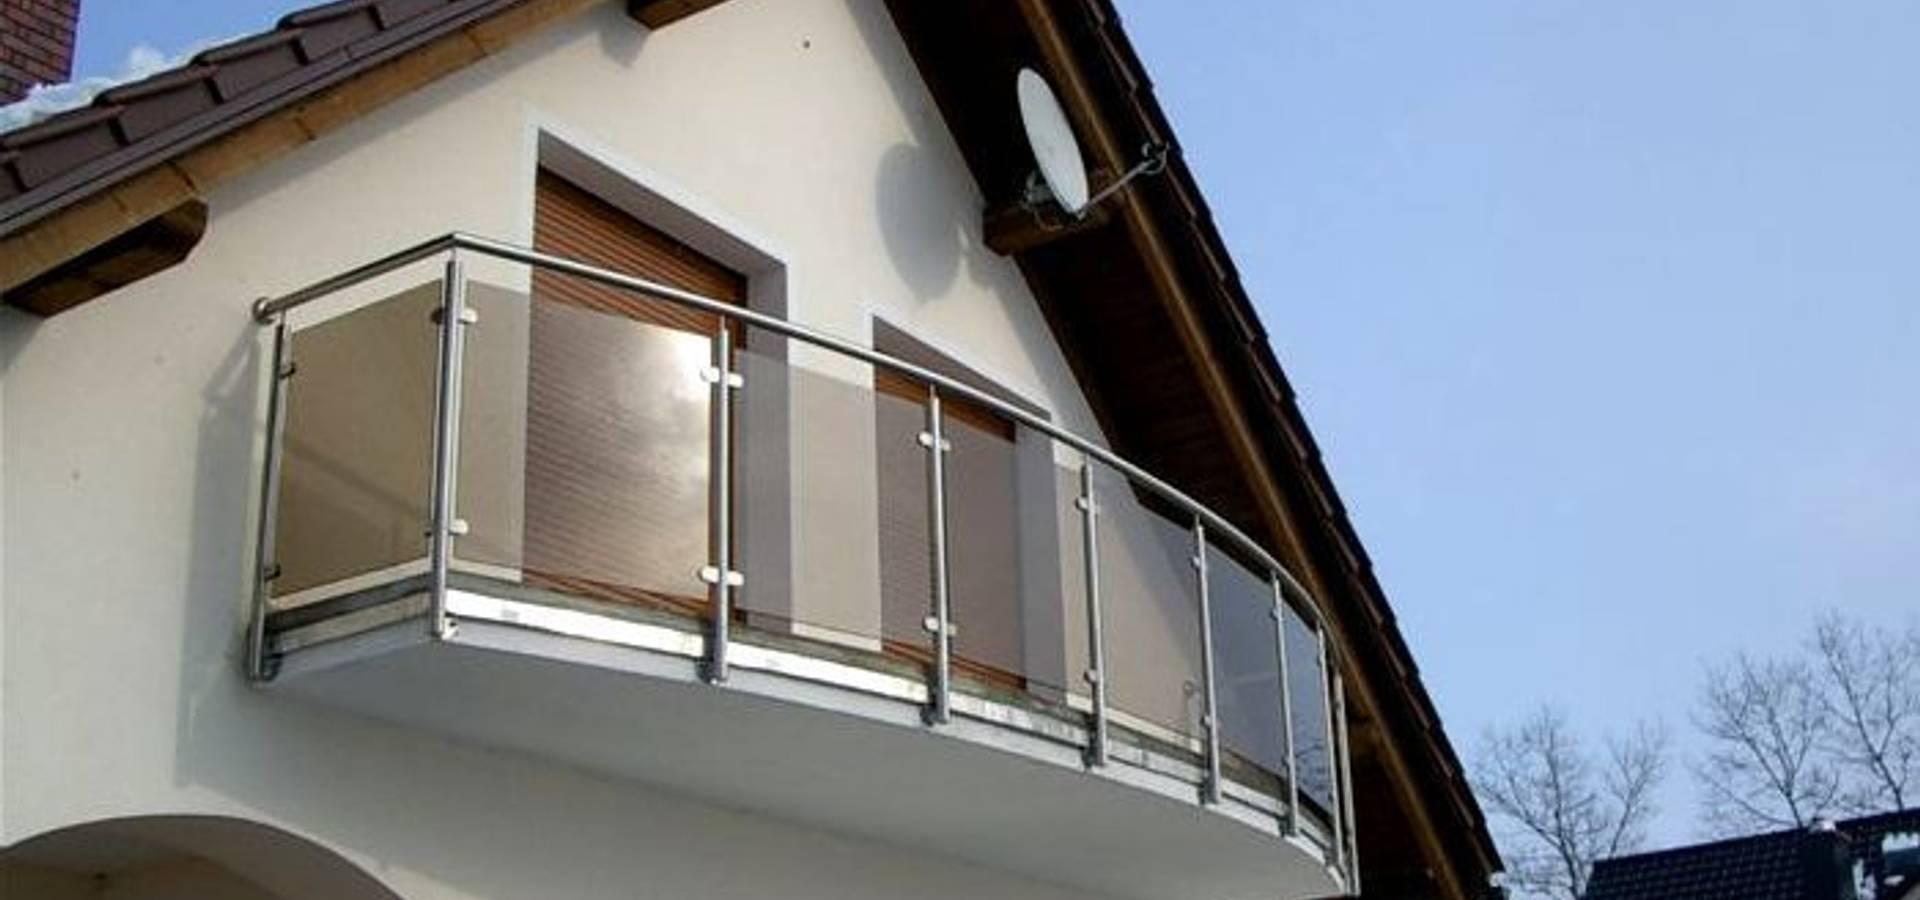 franz sische balkone by stalmach group homify. Black Bedroom Furniture Sets. Home Design Ideas